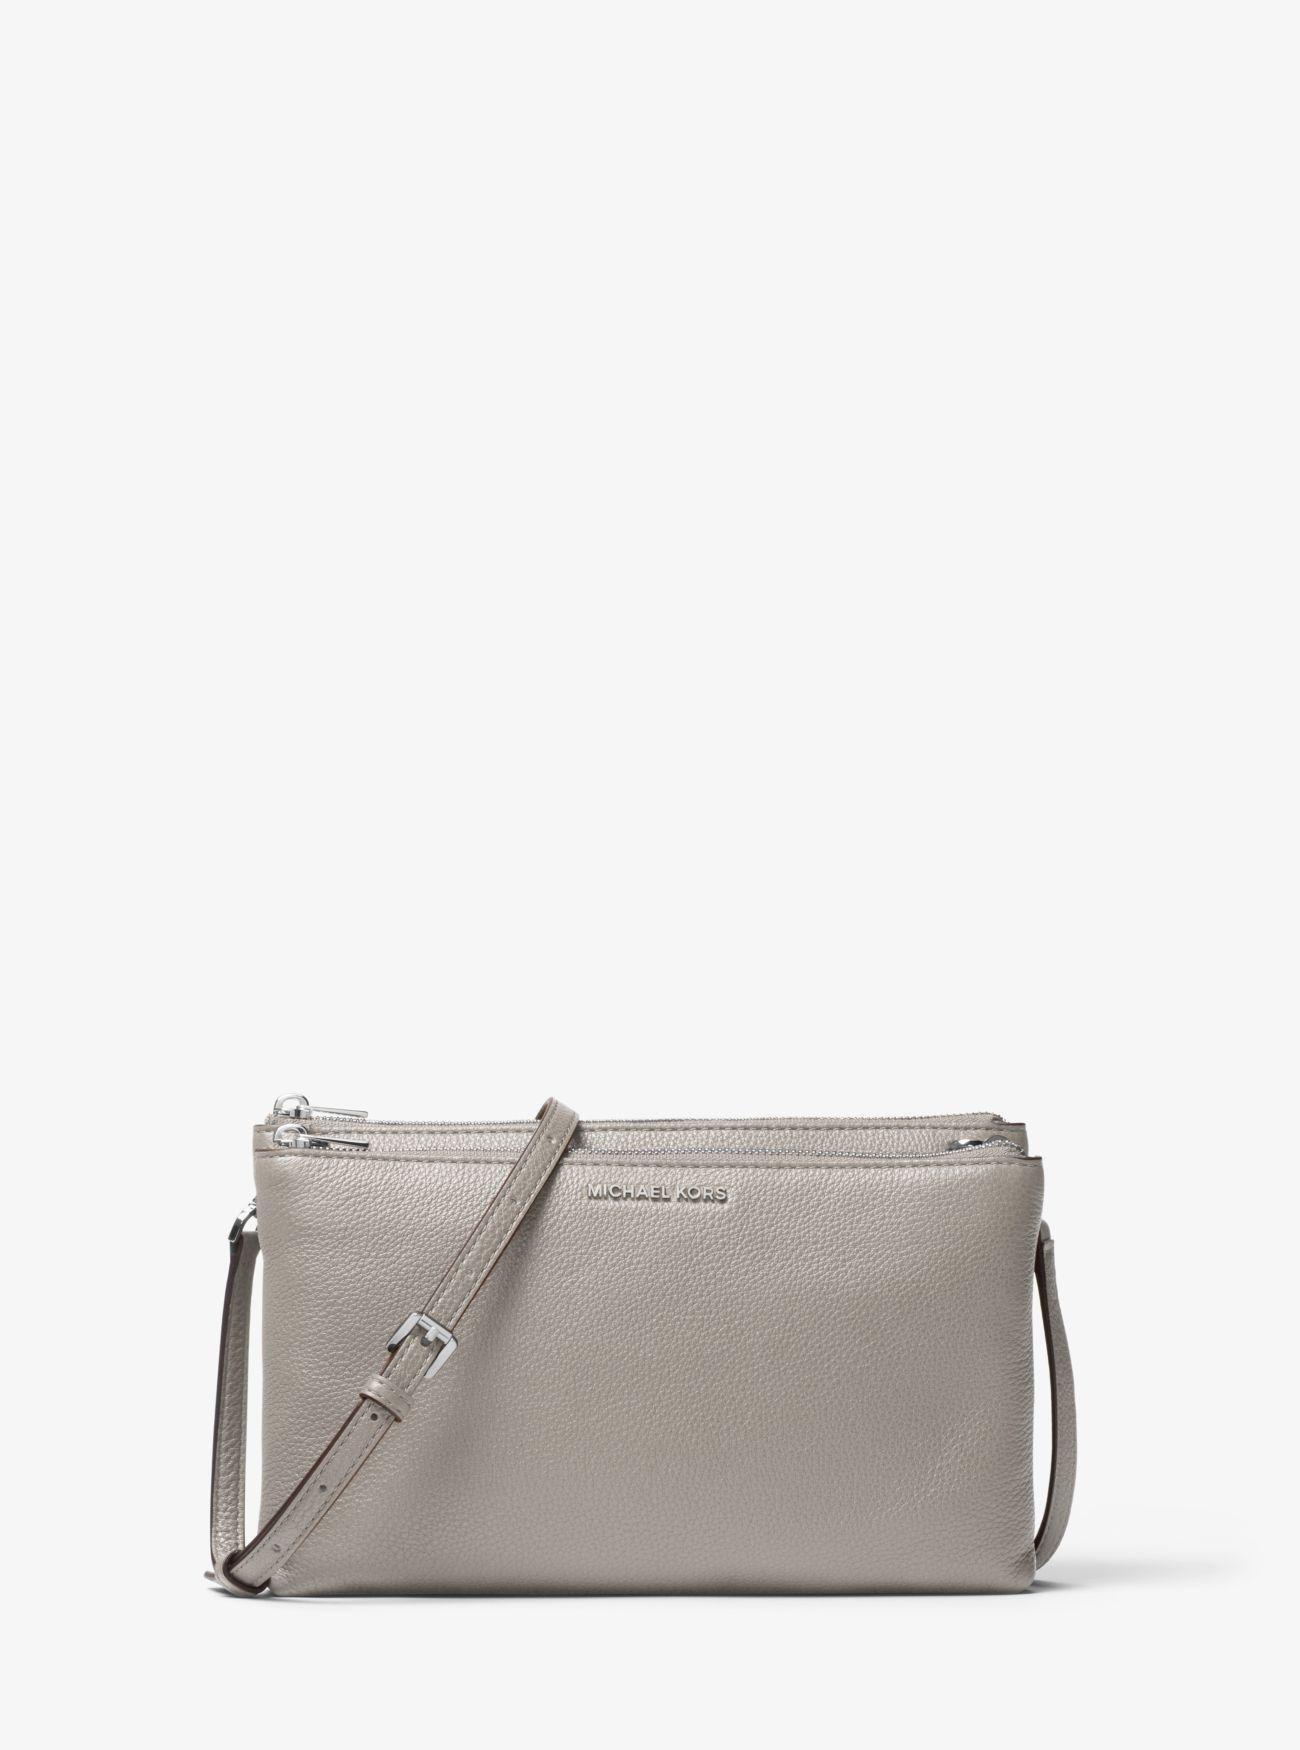 a3a753ec62d452 Michael Kors - Gray Adele Leather Crossbody Bag - Lyst. View fullscreen